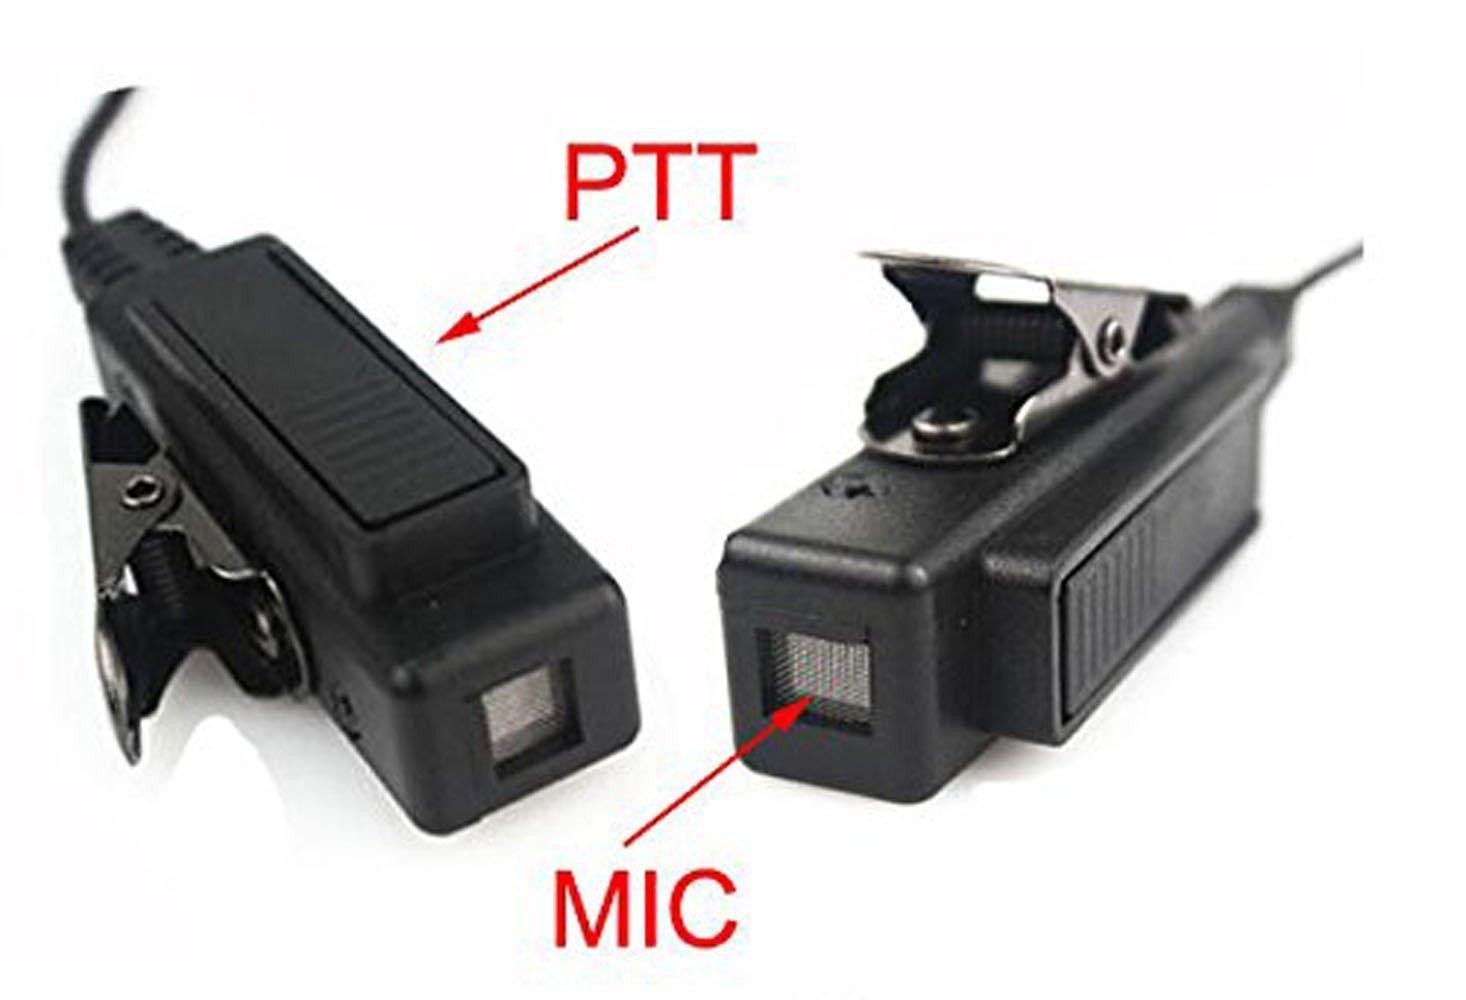 FANVERIM Covert Acoustic Tube Earpiece Headset Mic Compatible For Motorola XIR P6600 XIR P6620 XPR3300 XPR3500 E8600 E8608 Two-Way Radio DZMIDGP660